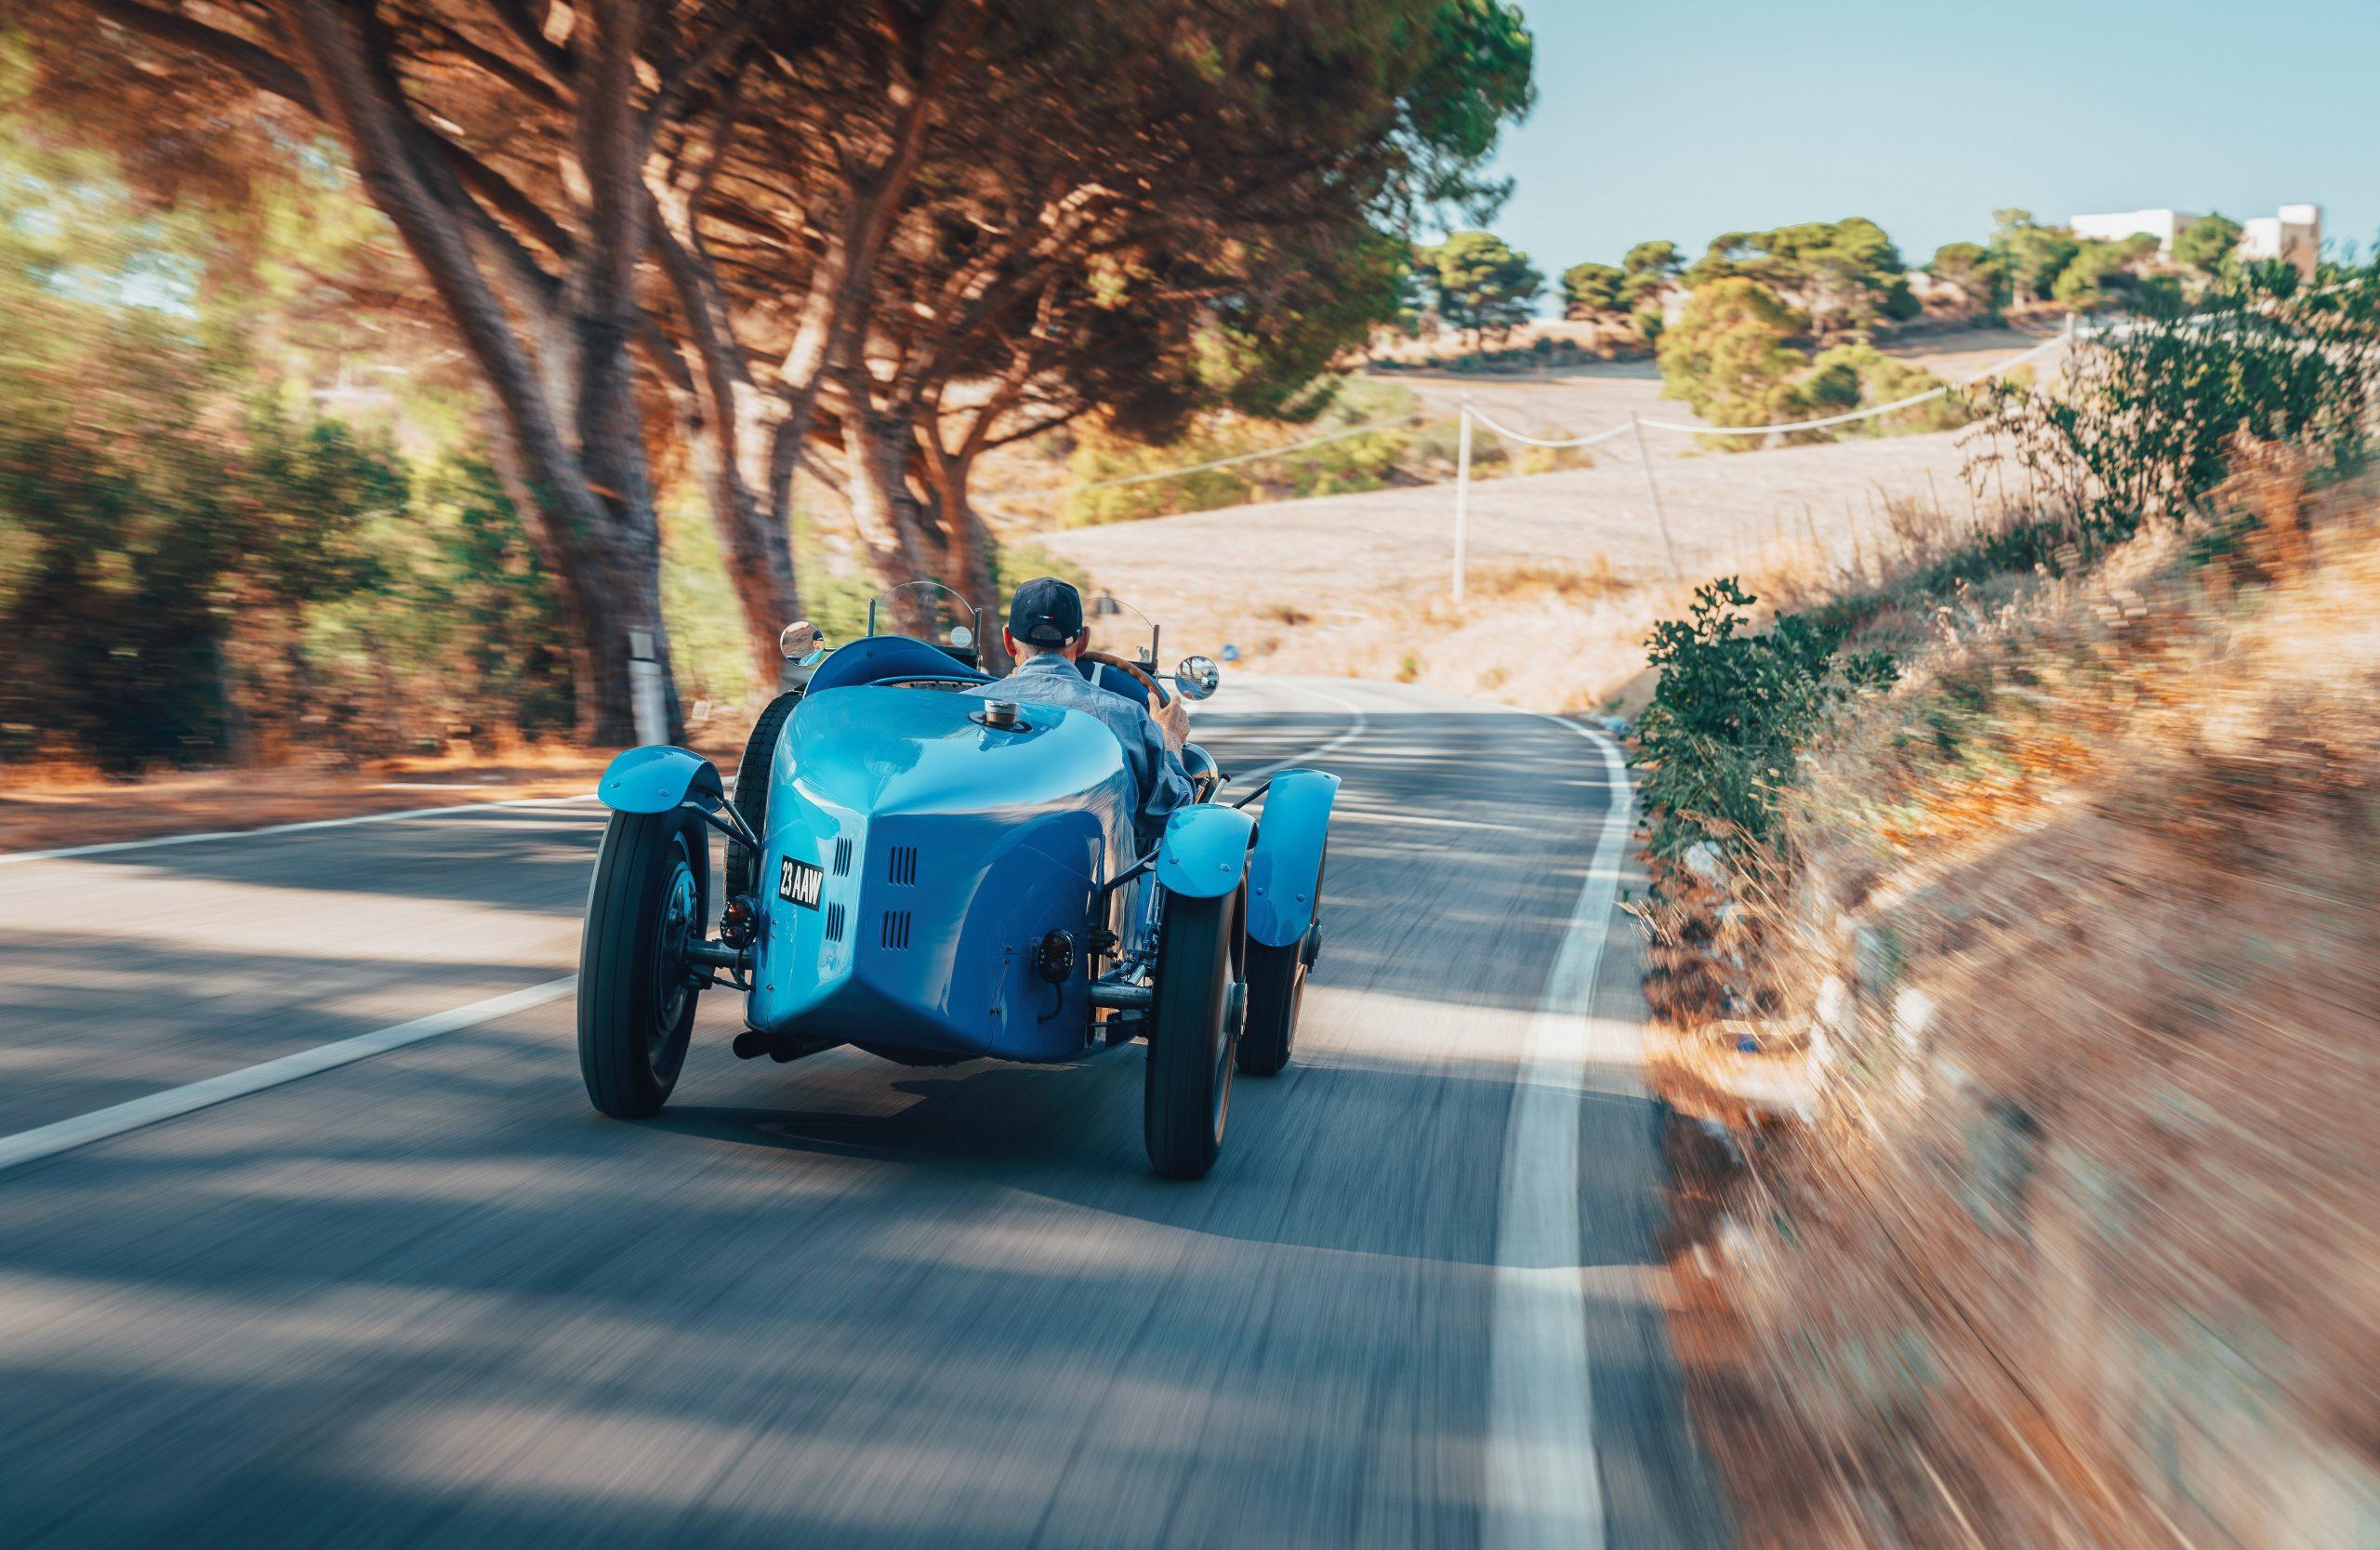 Targa Florio Bugatti Type 35 race car prewar vintage